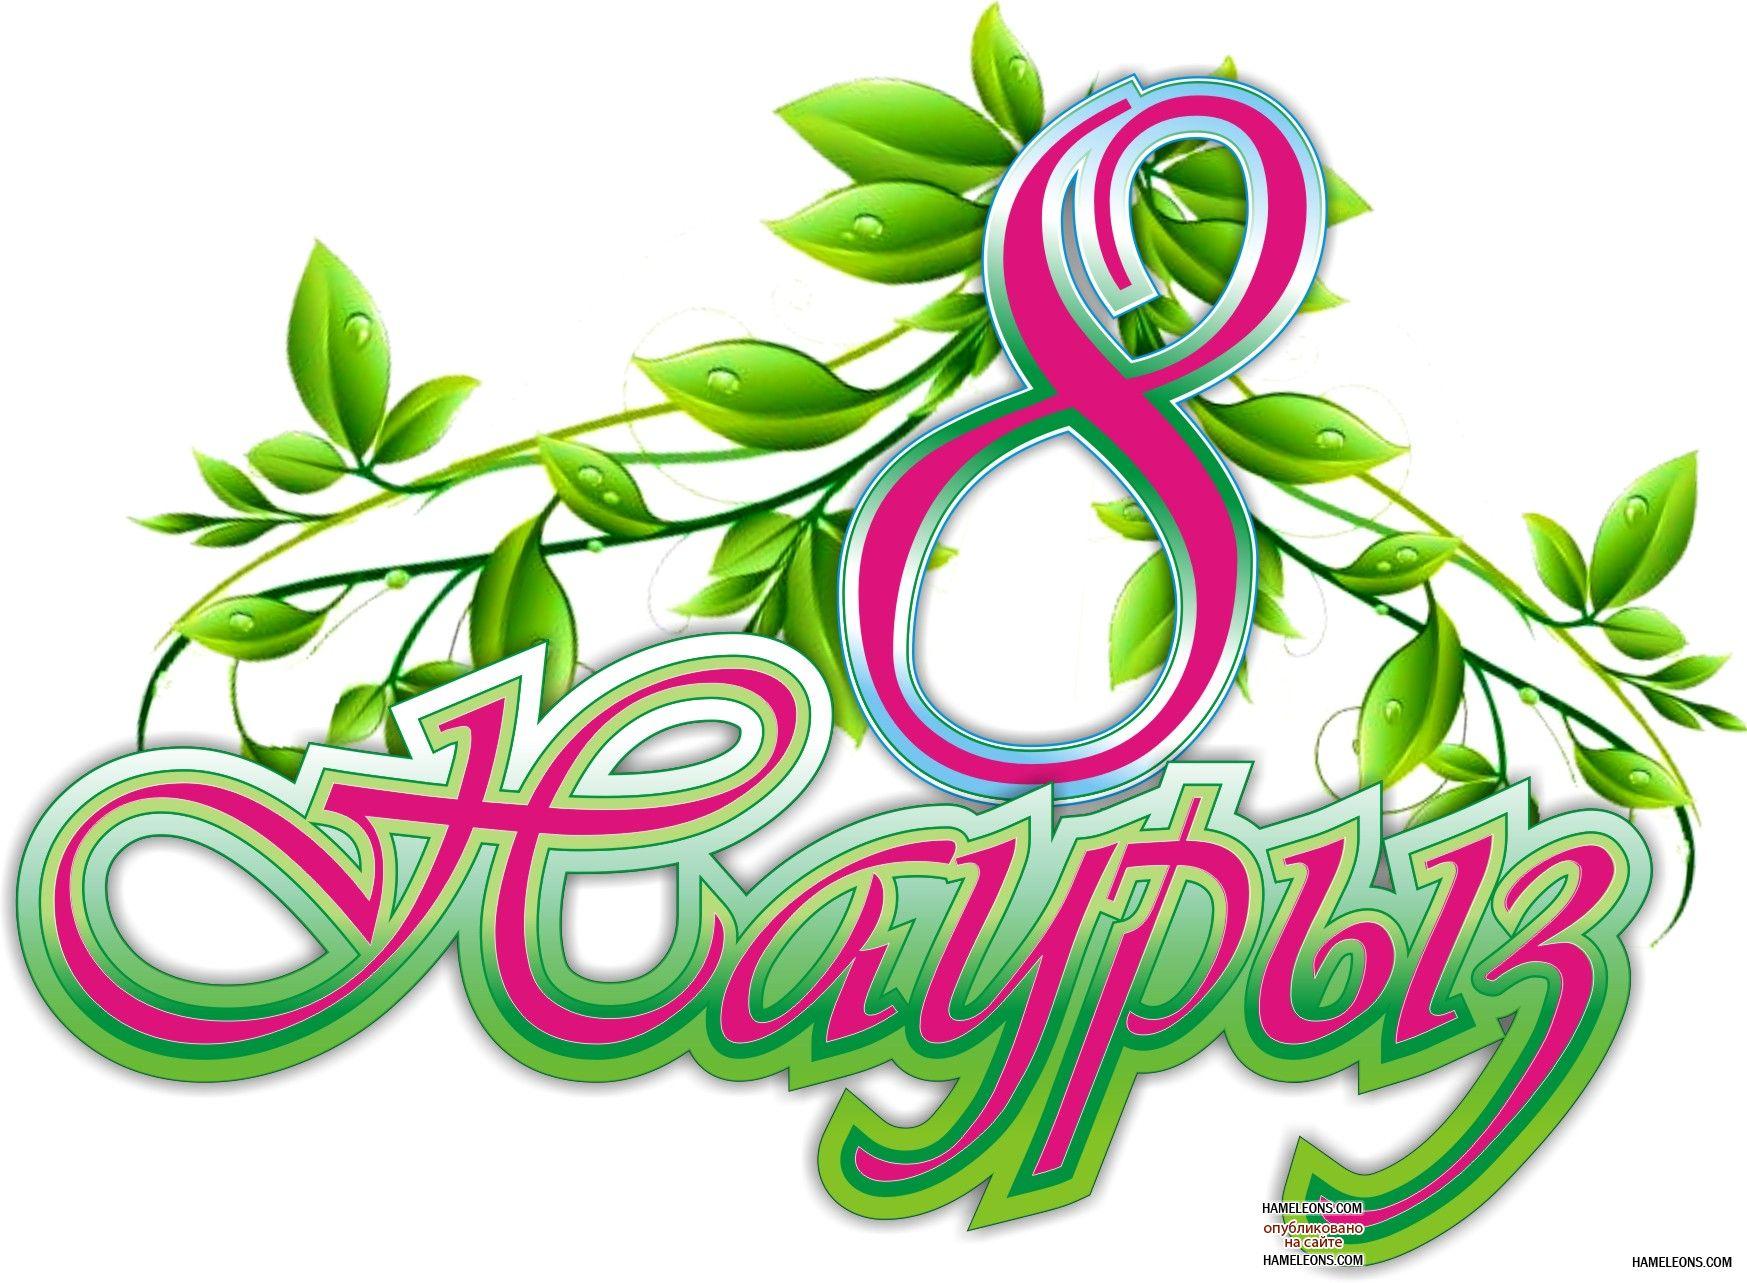 http://hameleons.com/uploads/posts/2012-03/1331402535_8-marta.jpg